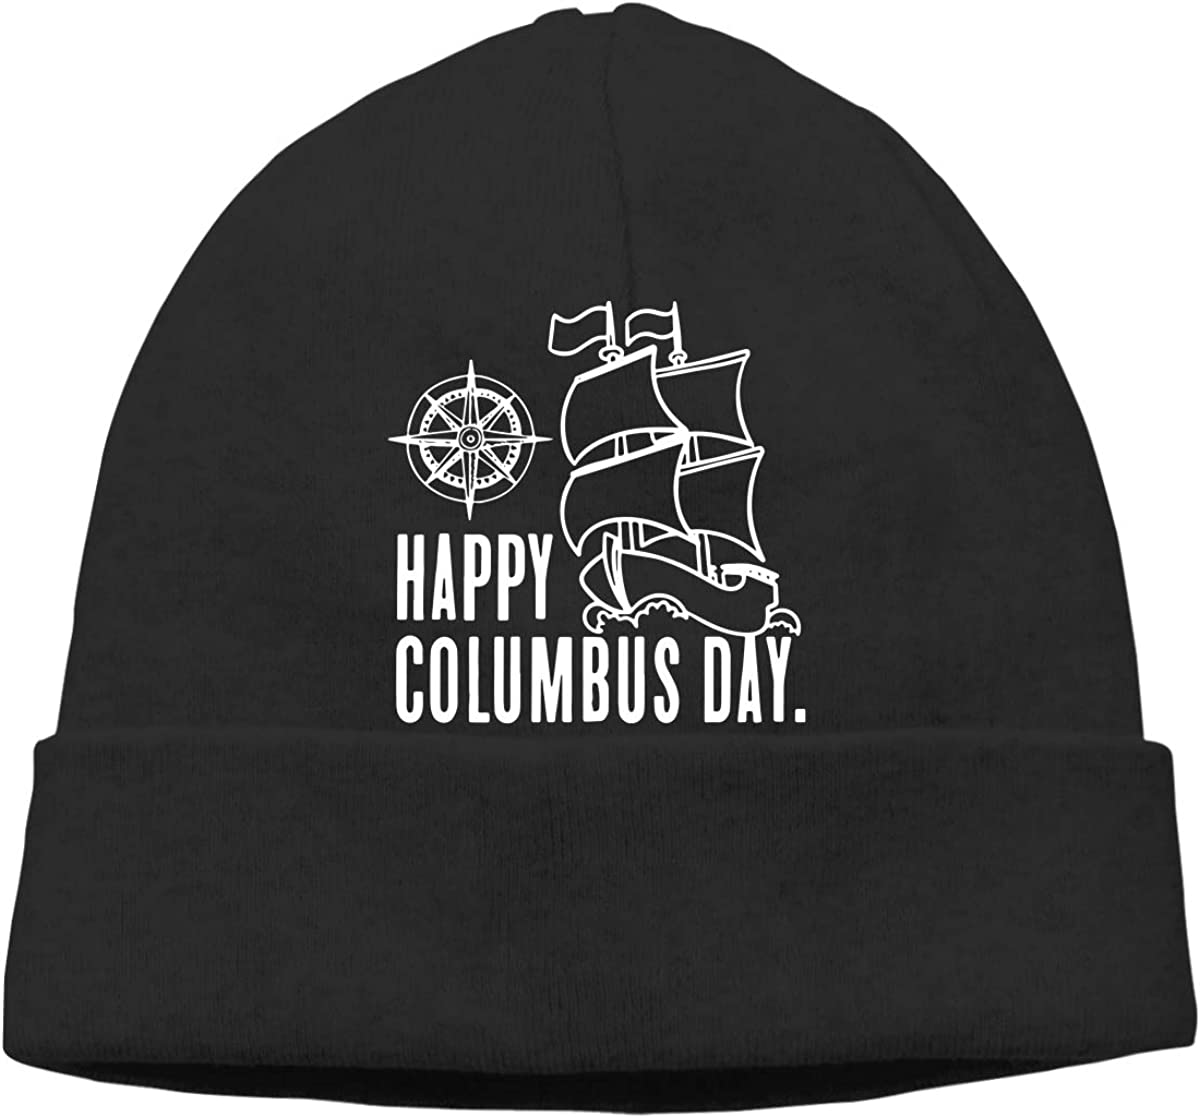 GDSG5/&4 Happy Columbus Day Men and Women Knitting Wool Warm Surf Beanie Hats